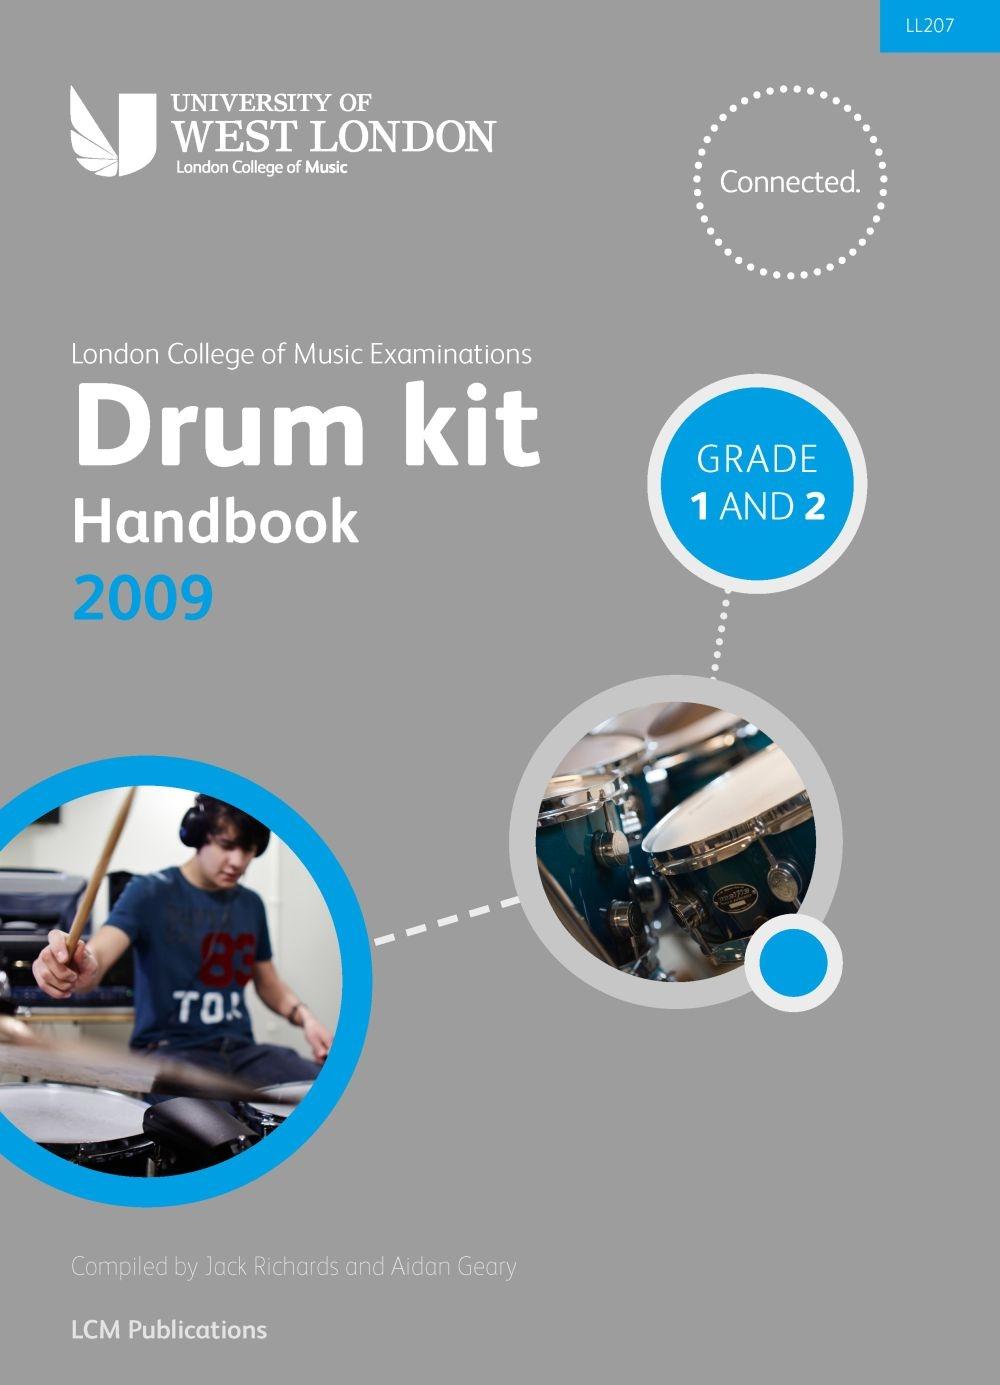 Lcm Drum Kit Handbook 2009 Grades 1 and 2: Drum Kit: Instrumental Tutor